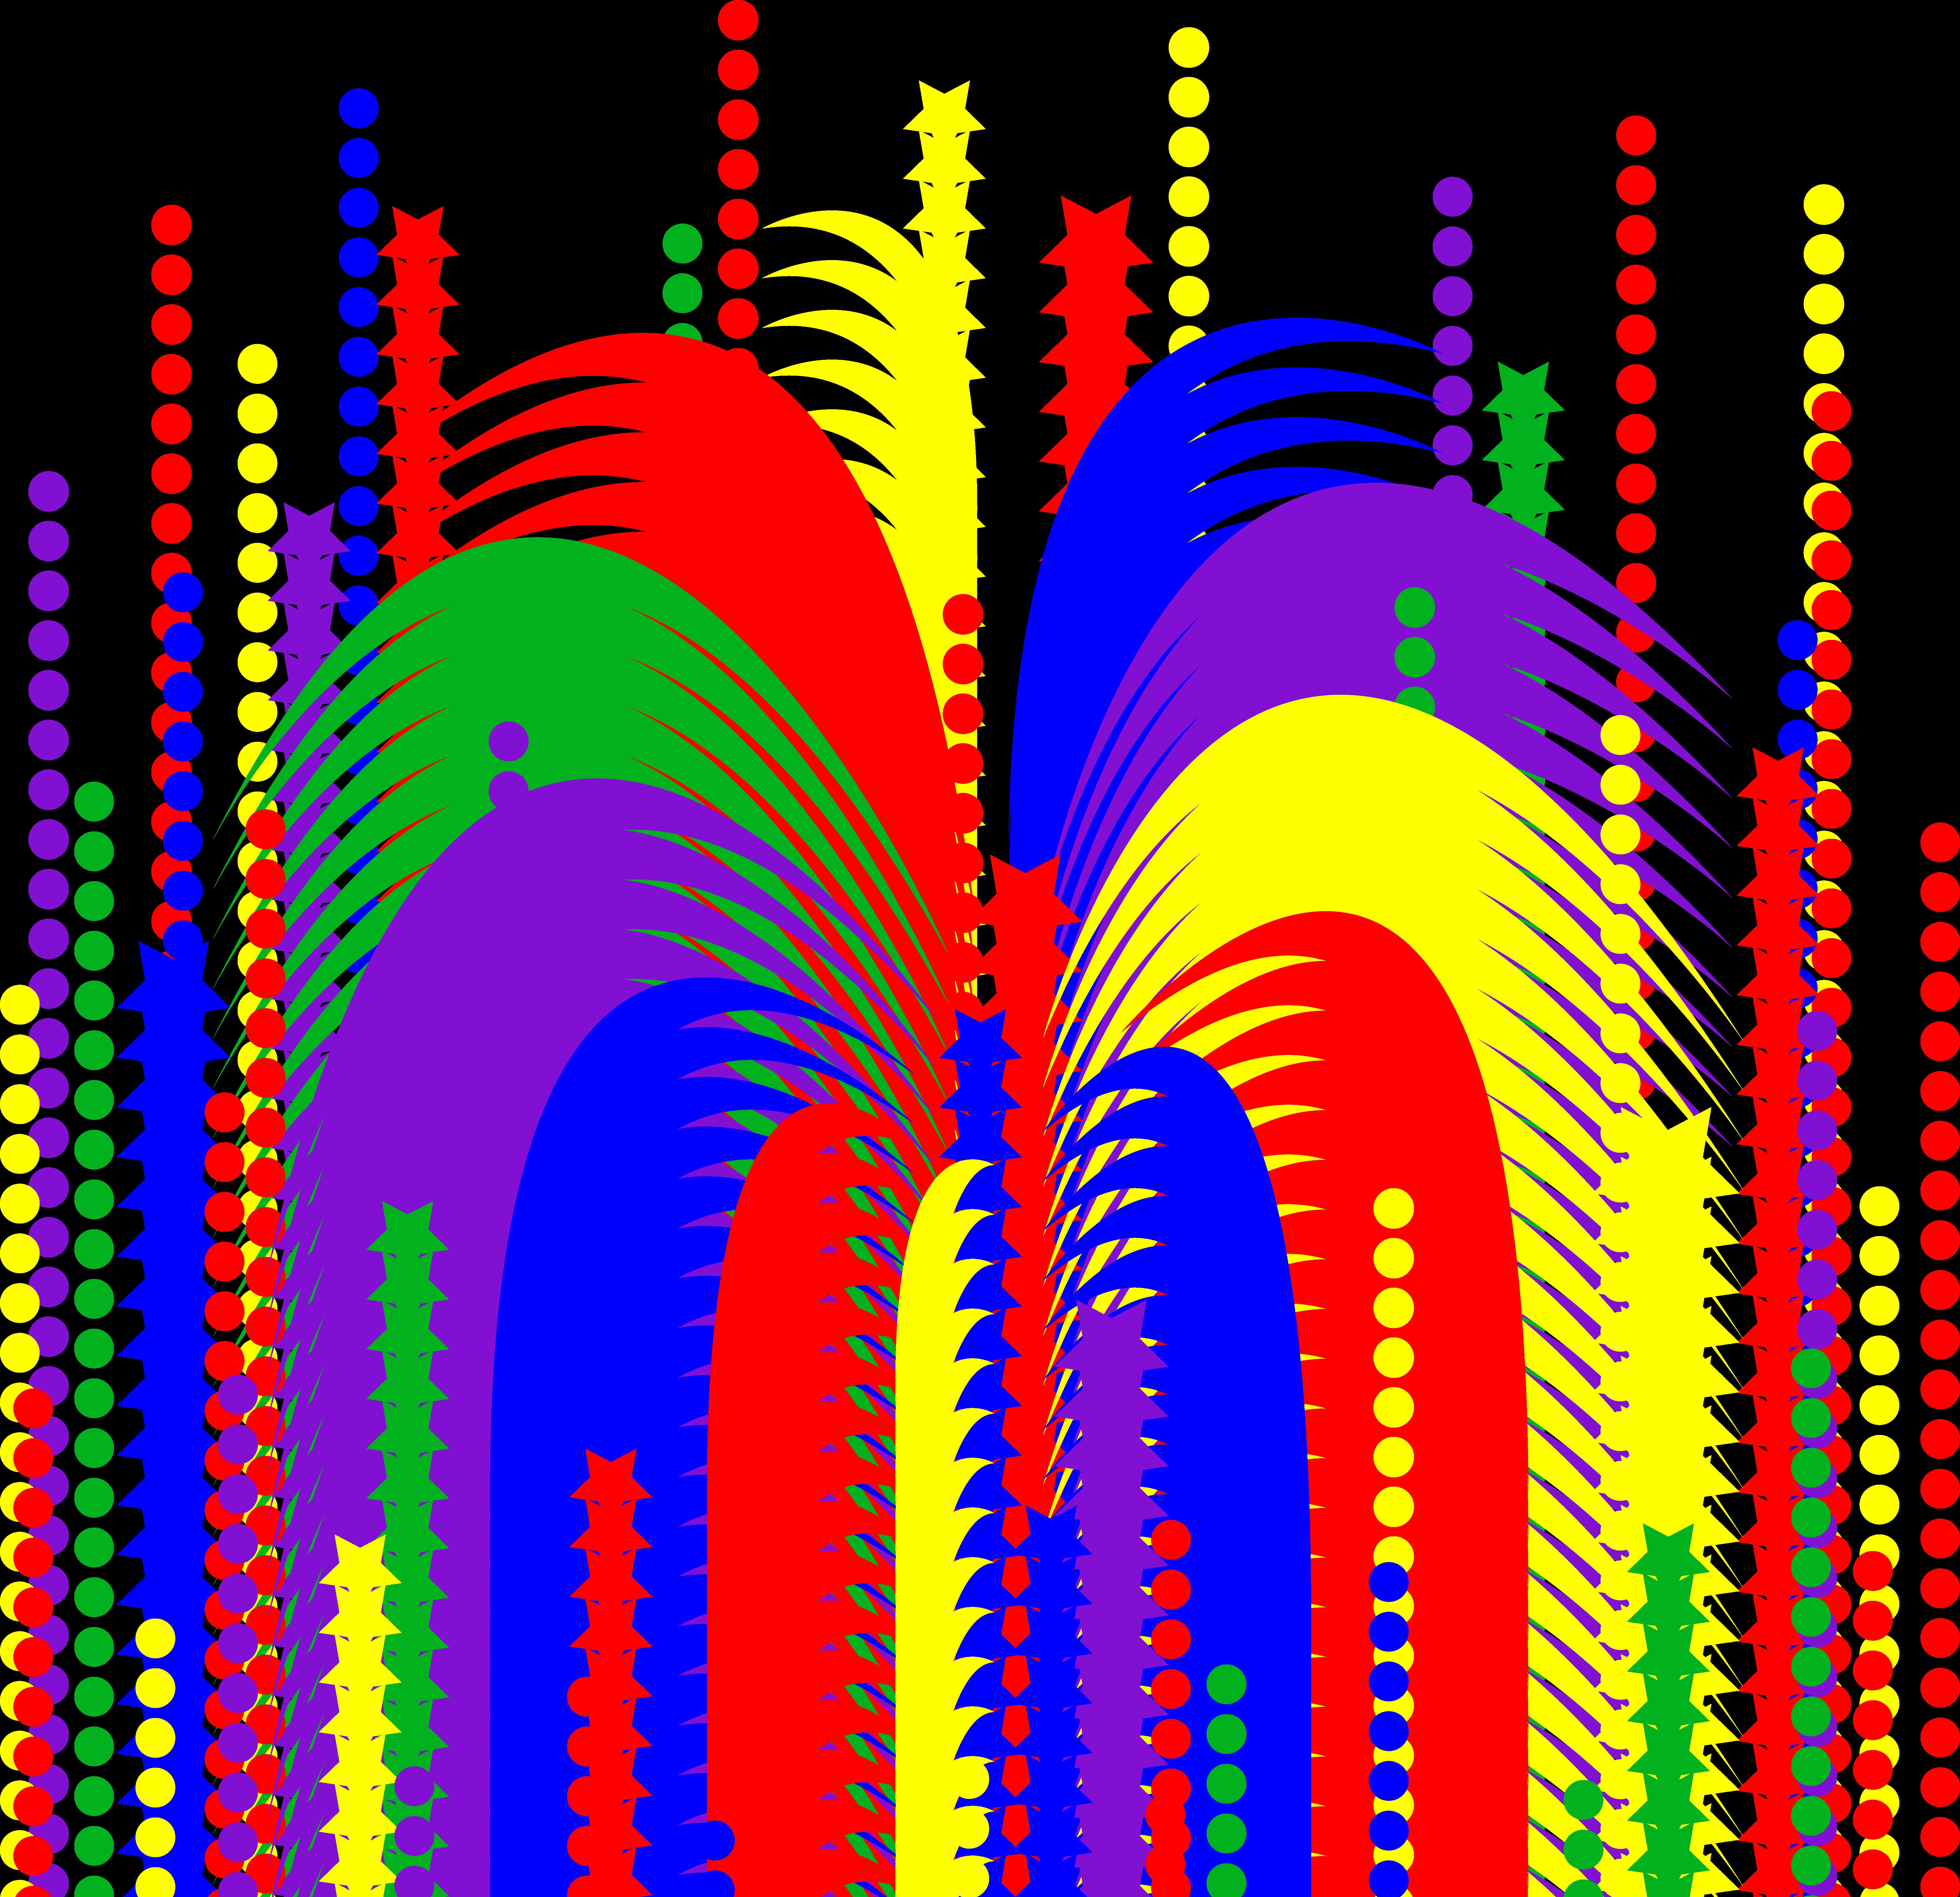 Free Celebration, Download Free Clip Art, Free Clip Art on.